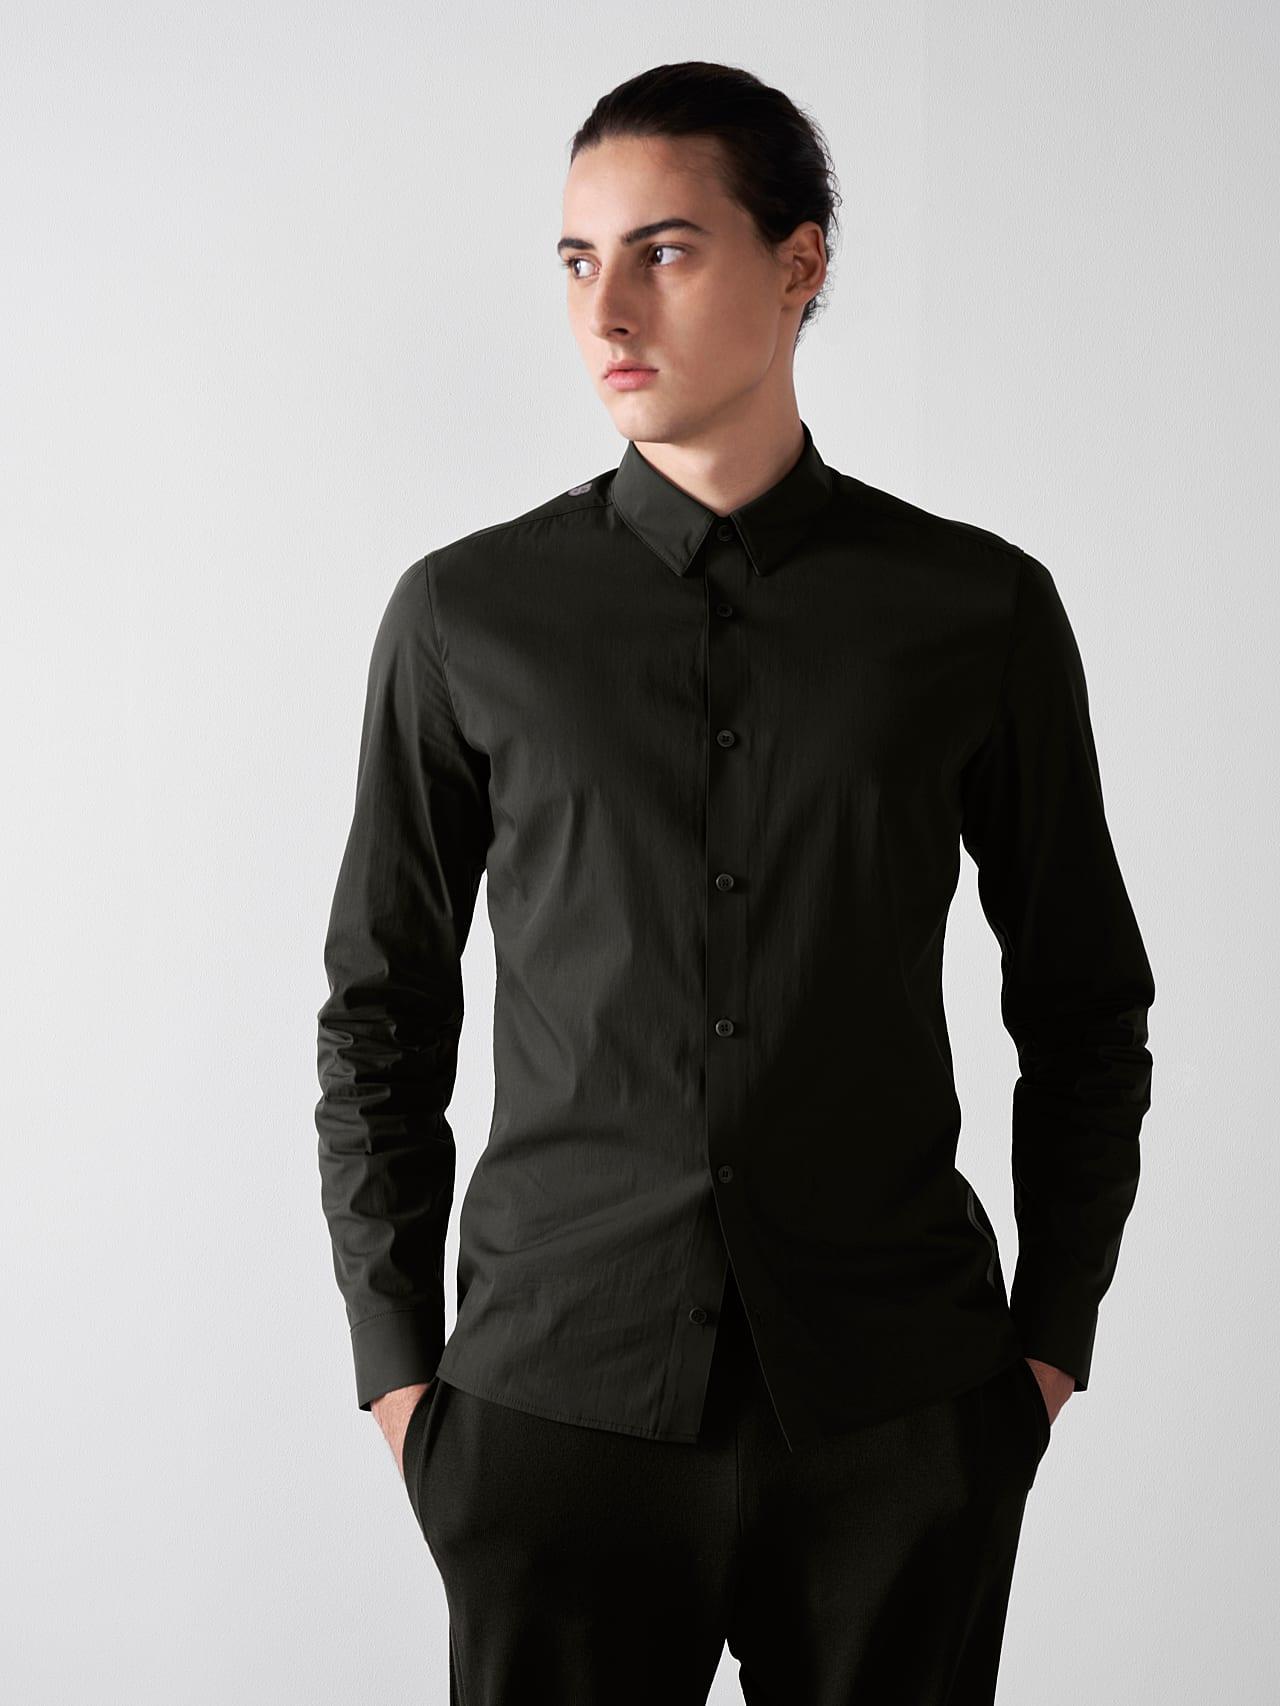 WAARG V1.Y5.01 Cotton-Stretch Shirt olive Model shot Alpha Tauri